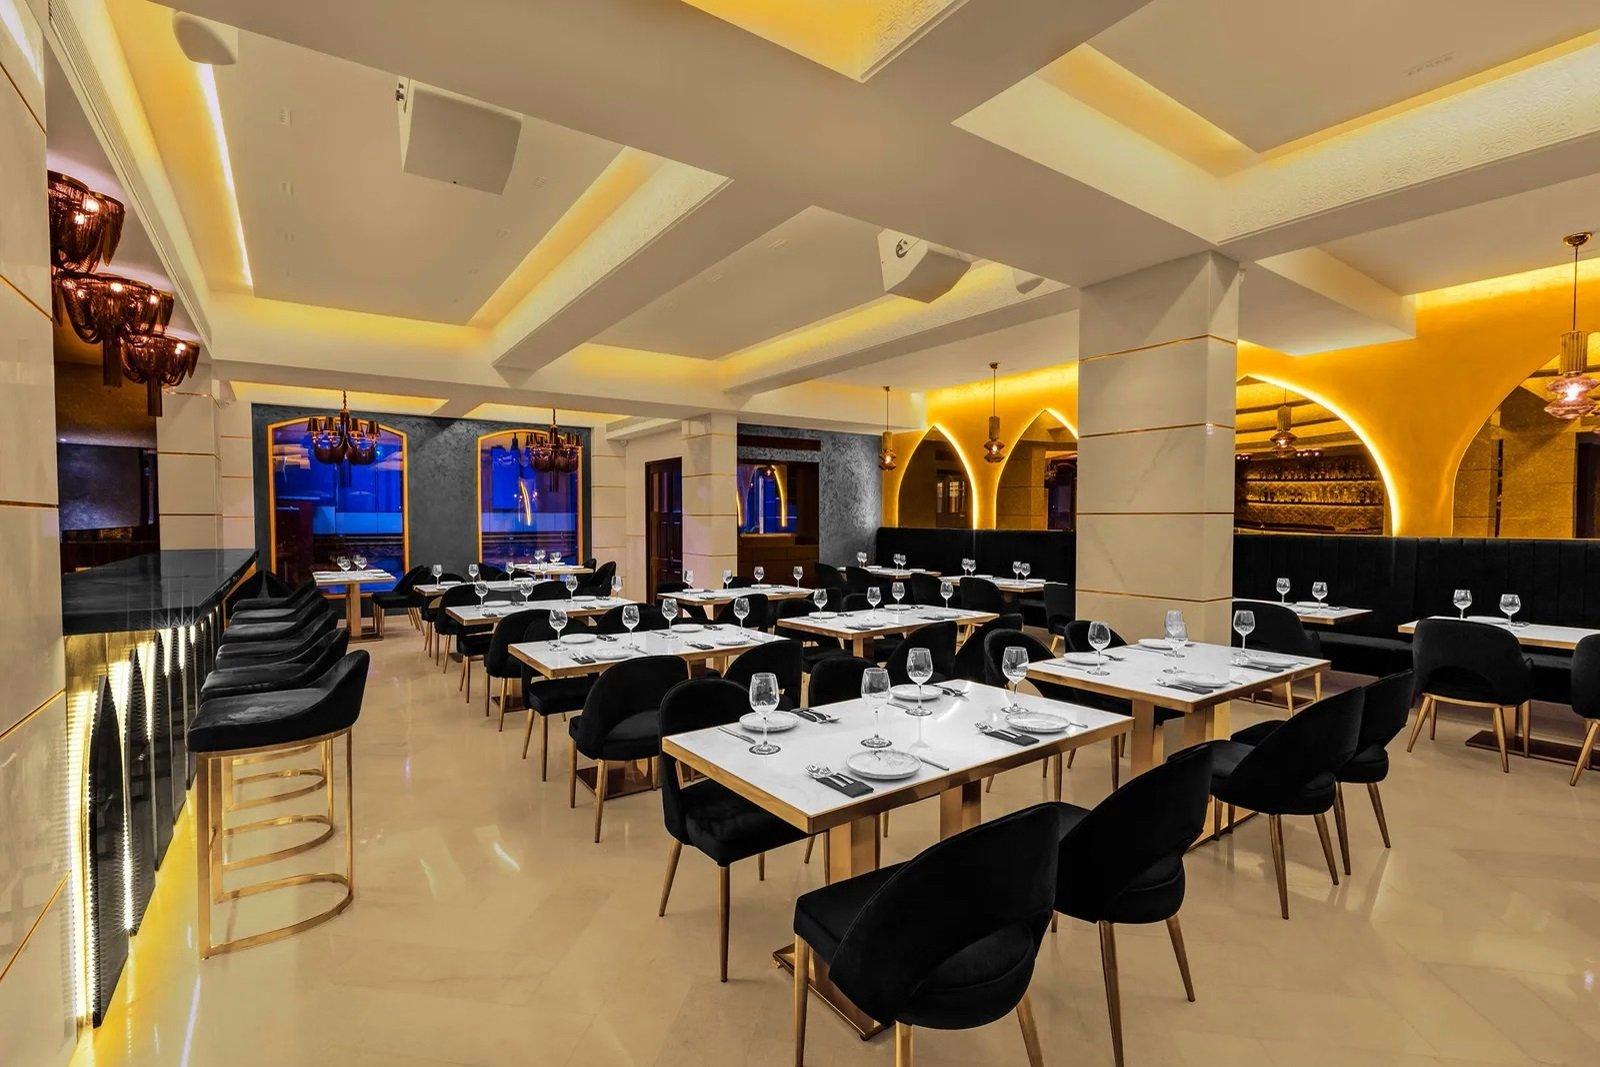 Ostaad Restaurant, Mumbai, a master of design